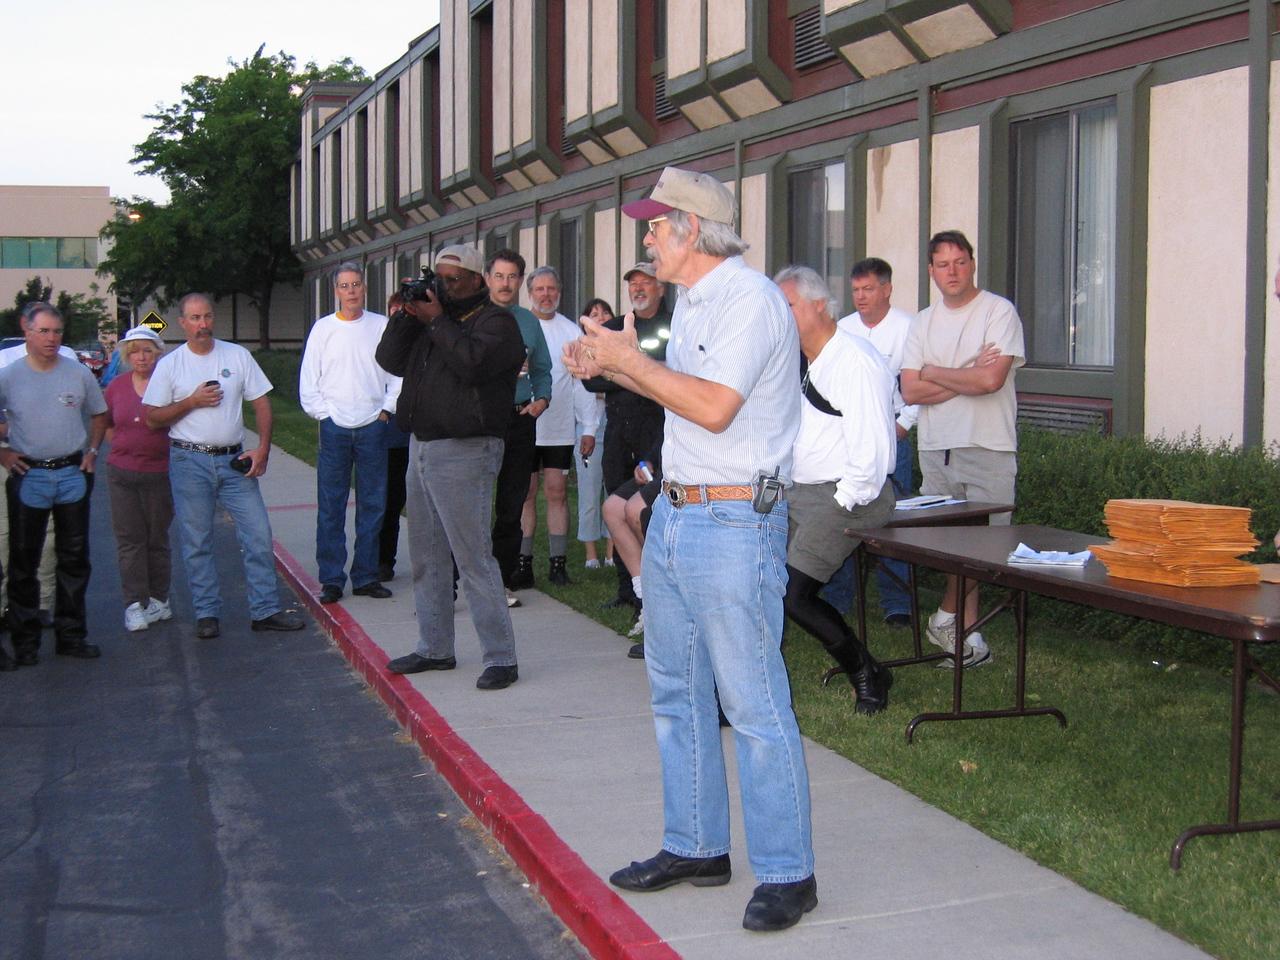 Rally master giving final instructions Saturday morning